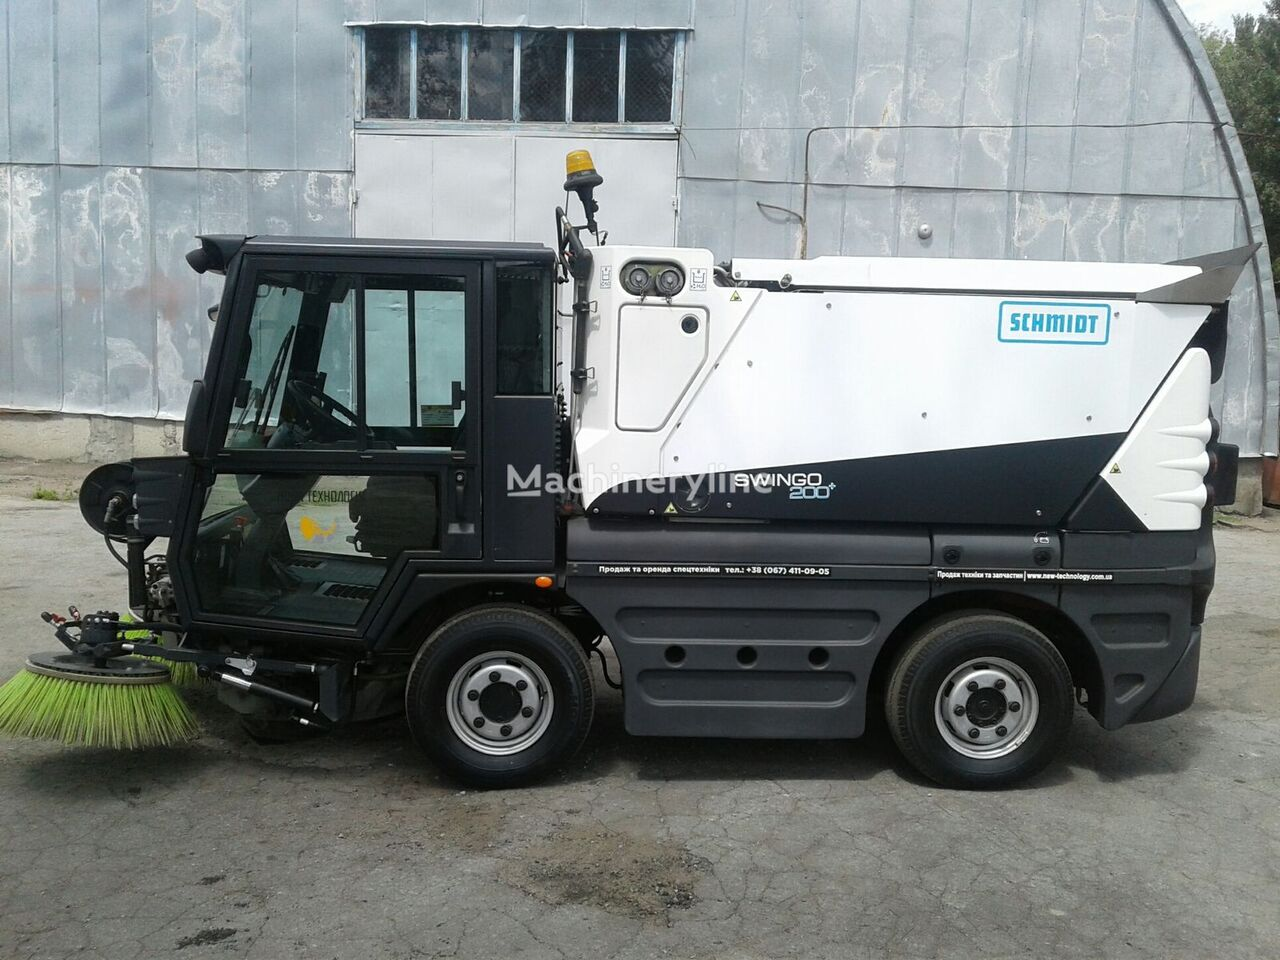 SCHMIDT Swingo 200+ (V NAYaVNOSTI) vozilo za čišćenje ulica